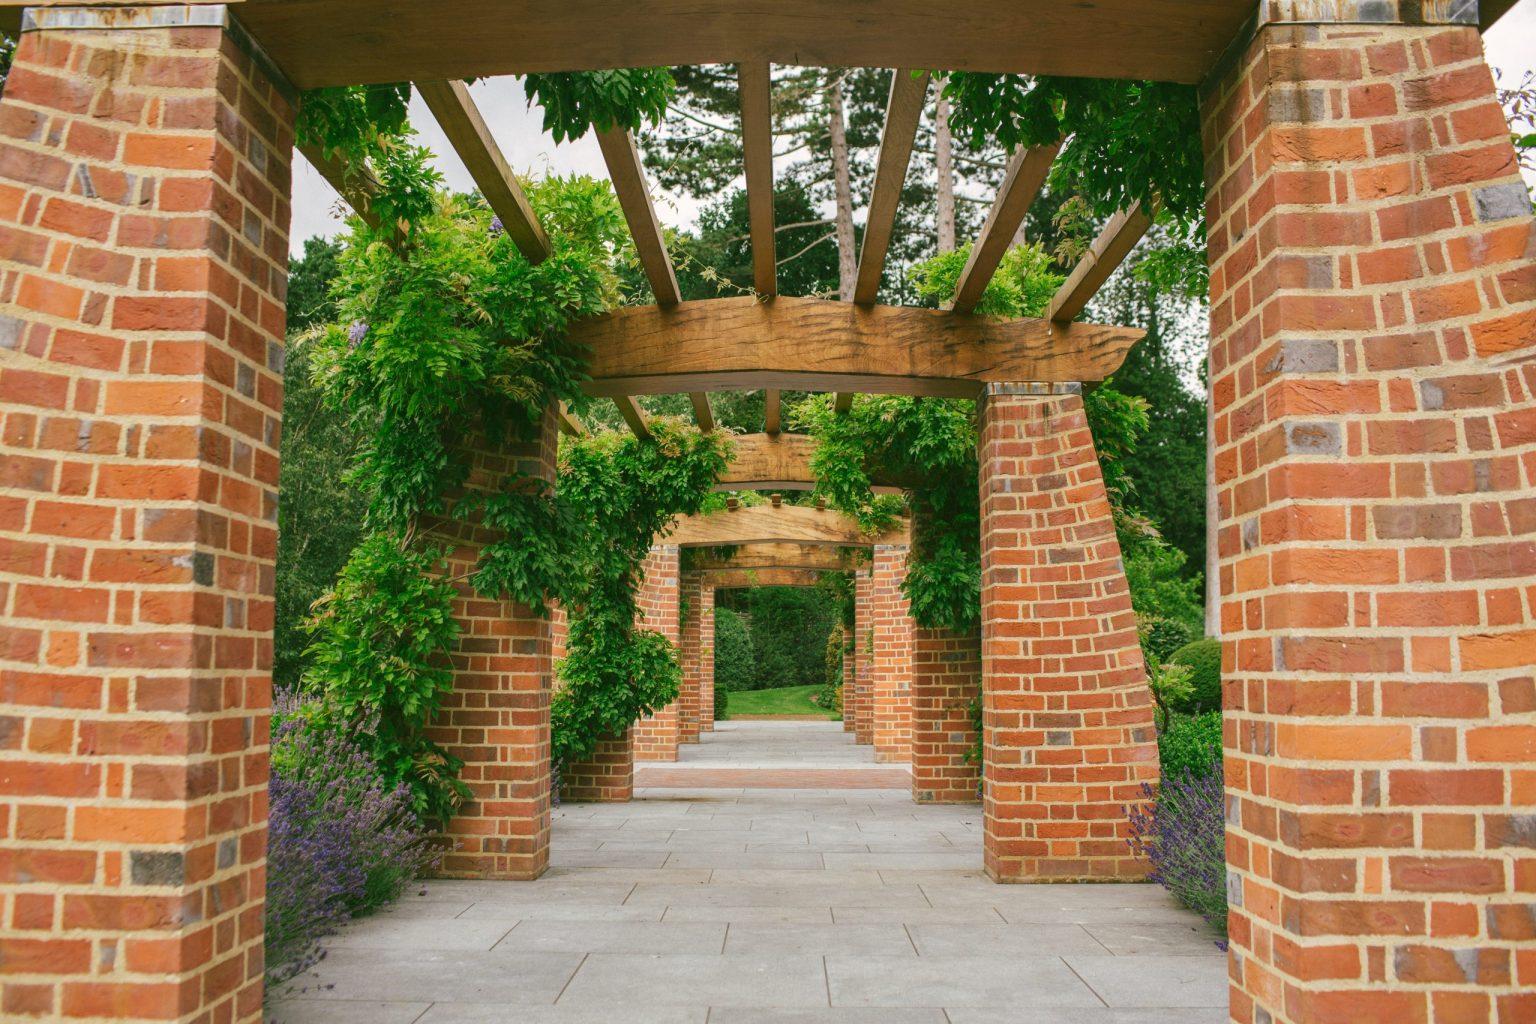 Brick and Oak garden pergola in Arts and Crafts garden